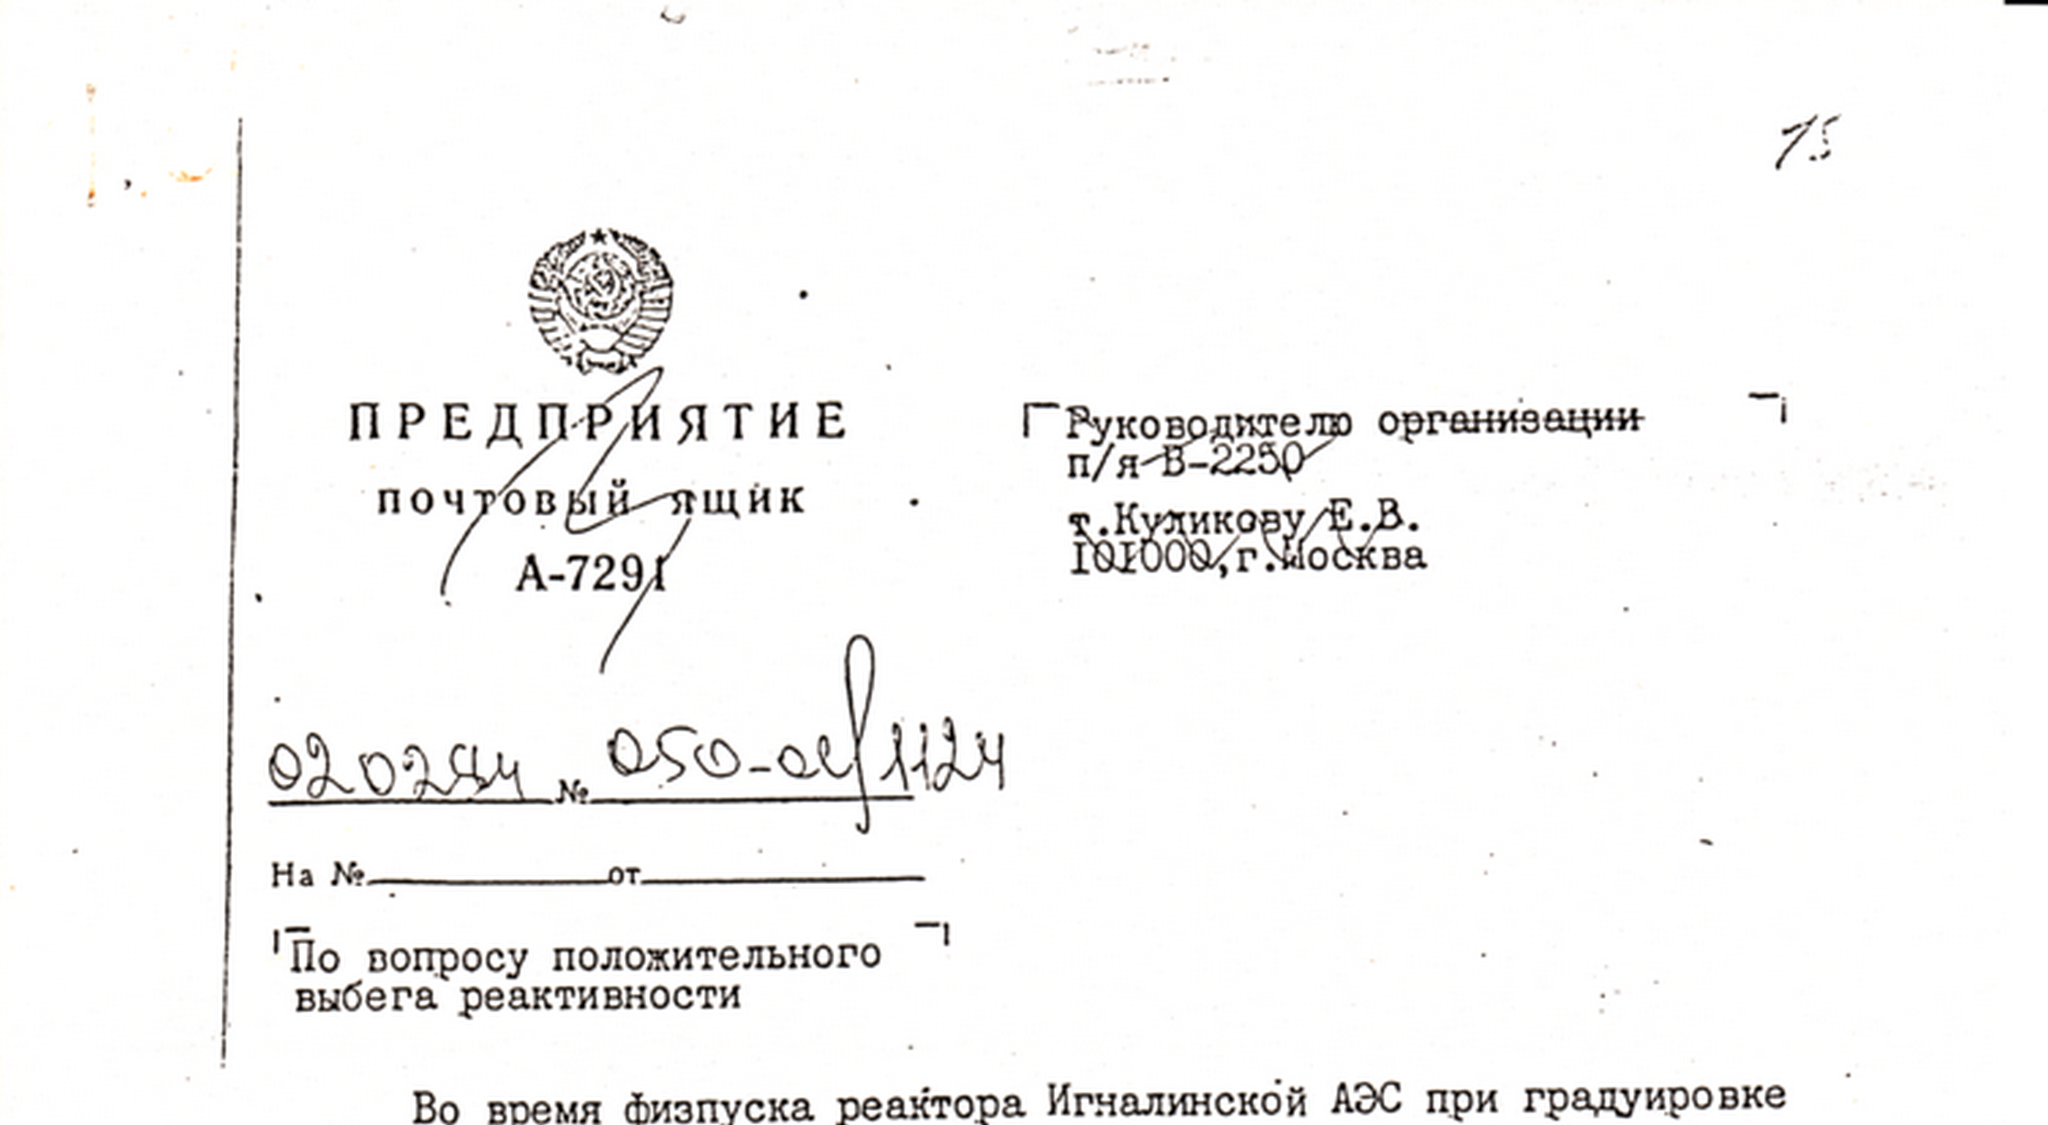 Letter from Ignalina NPP regarding Positive Run Up of Reactivity